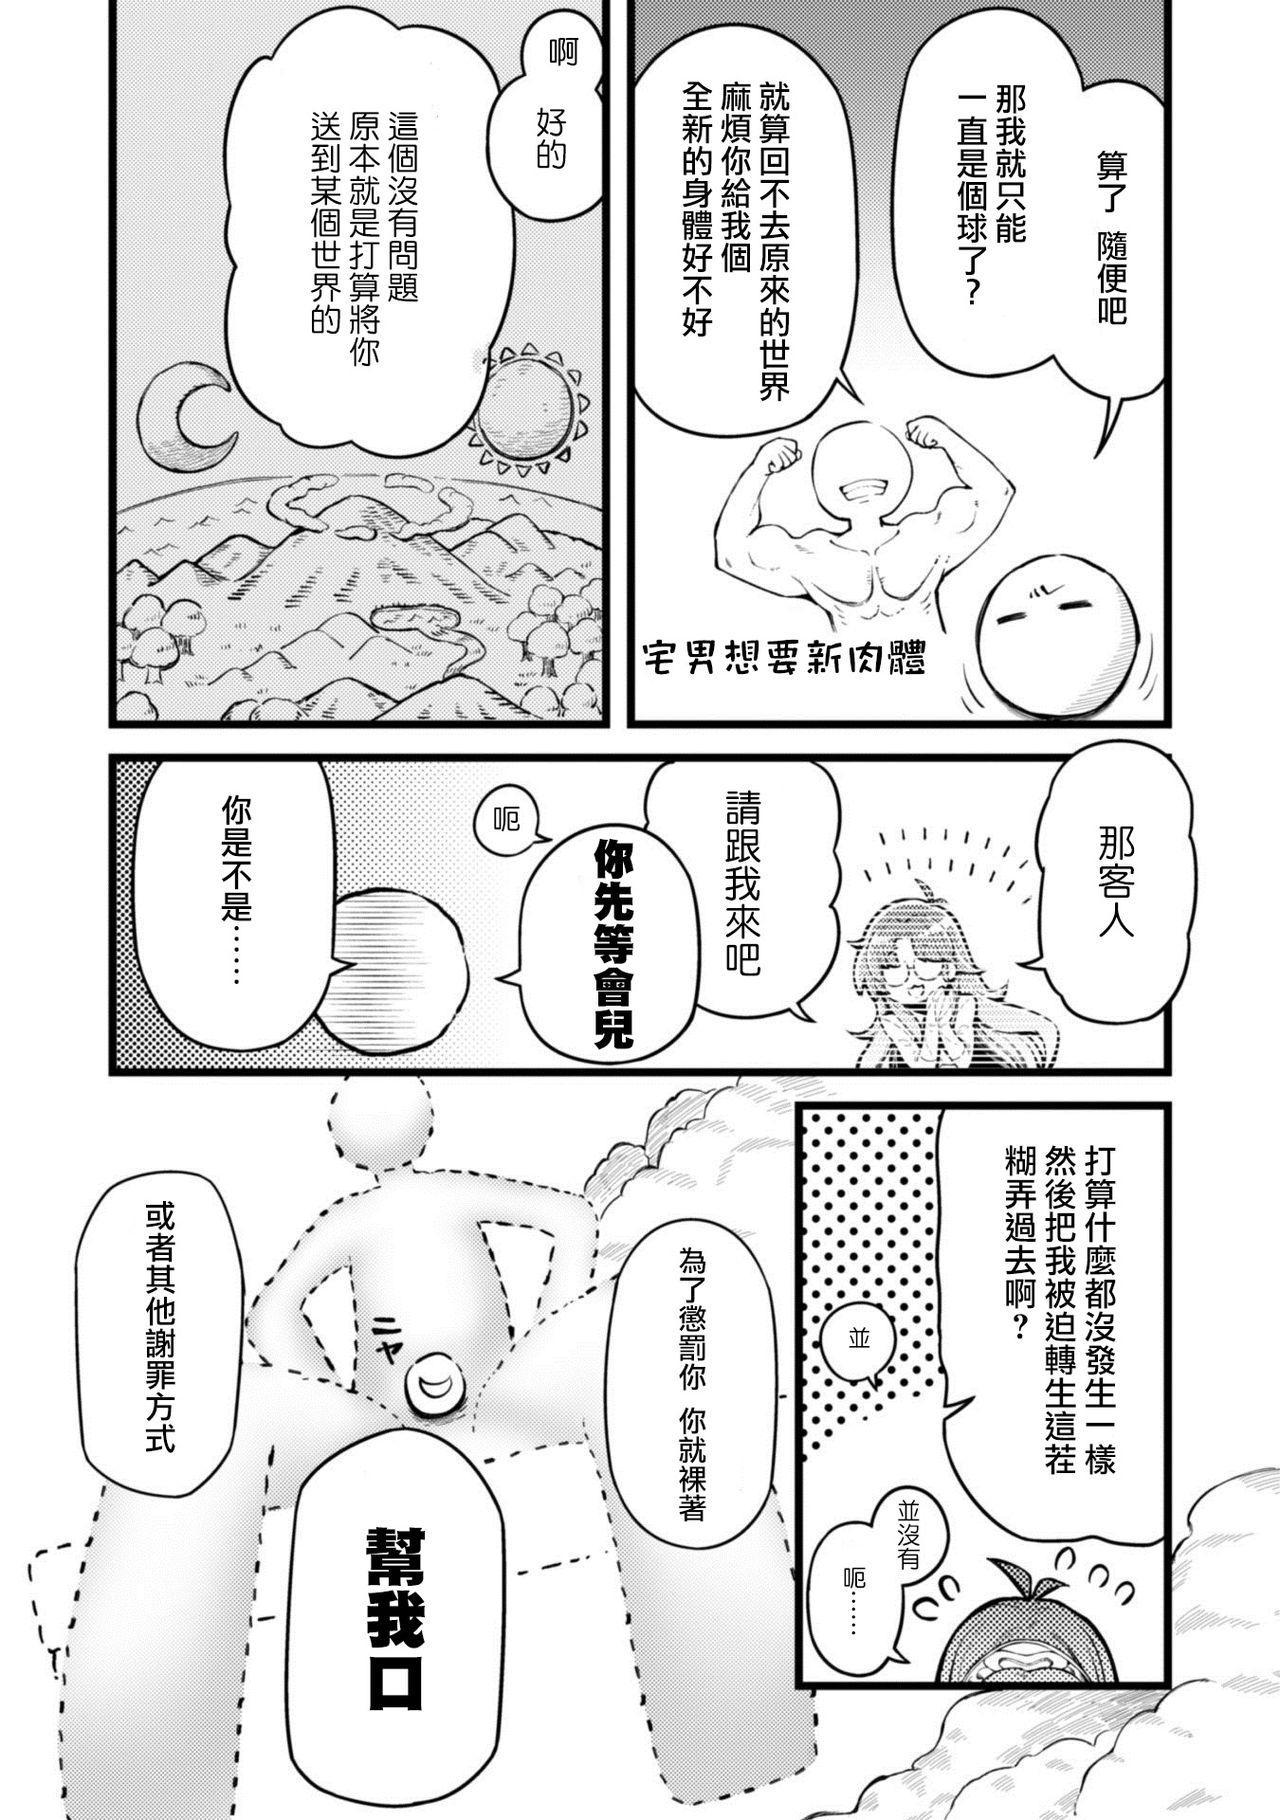 Eroi Skill de Isekai Musou Ch. 1 17